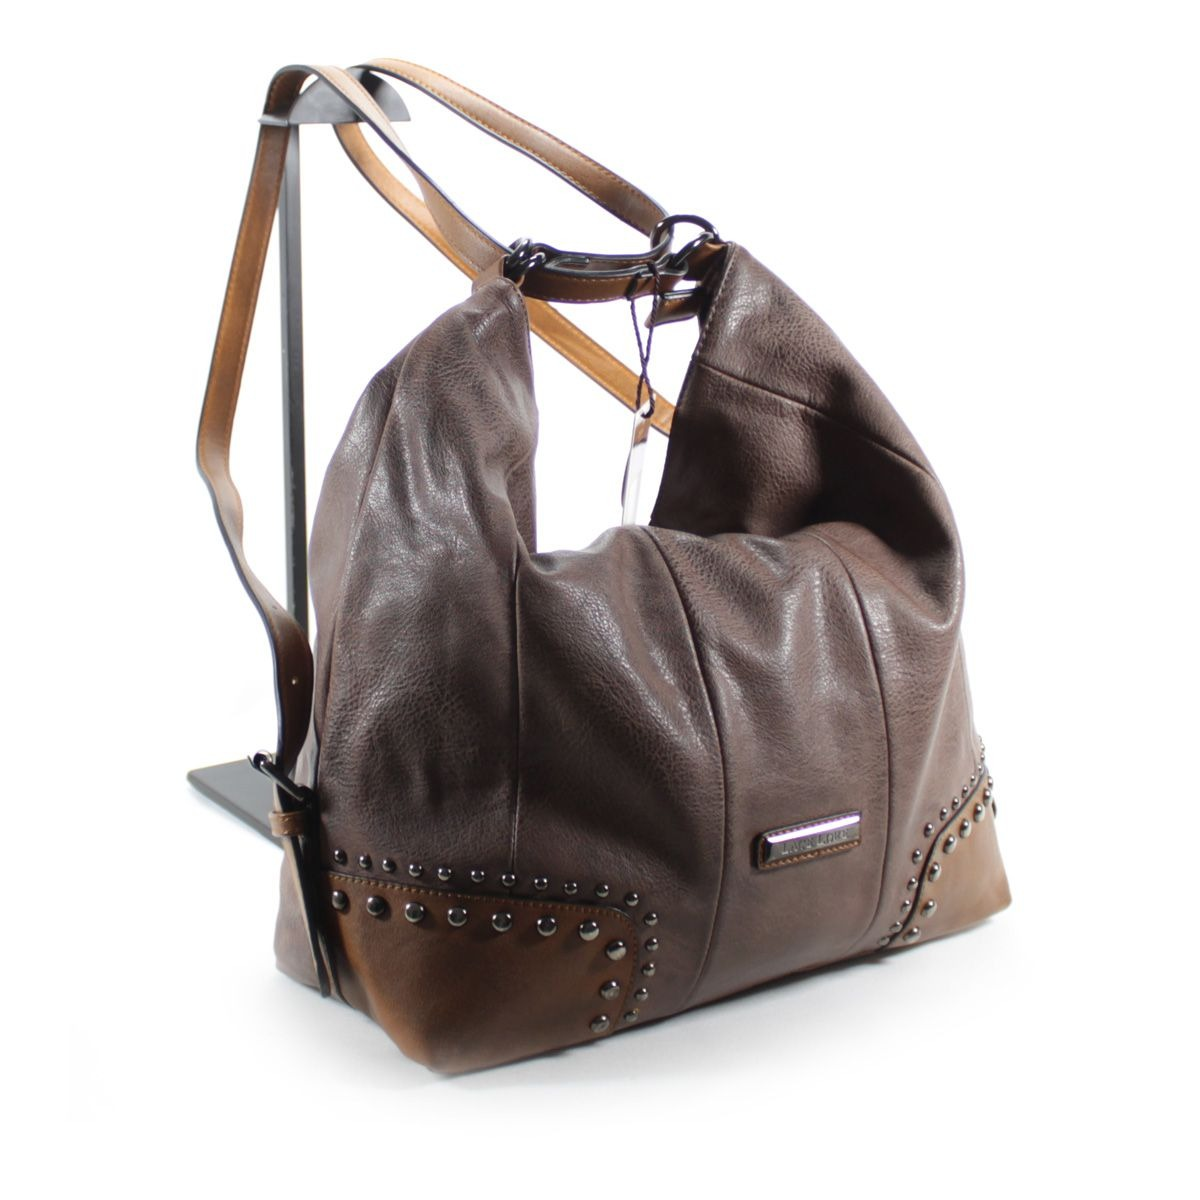 4320cceeba Carregando zoom... bolsa feminina grande couro ecologico bolsa e mochila -  nova